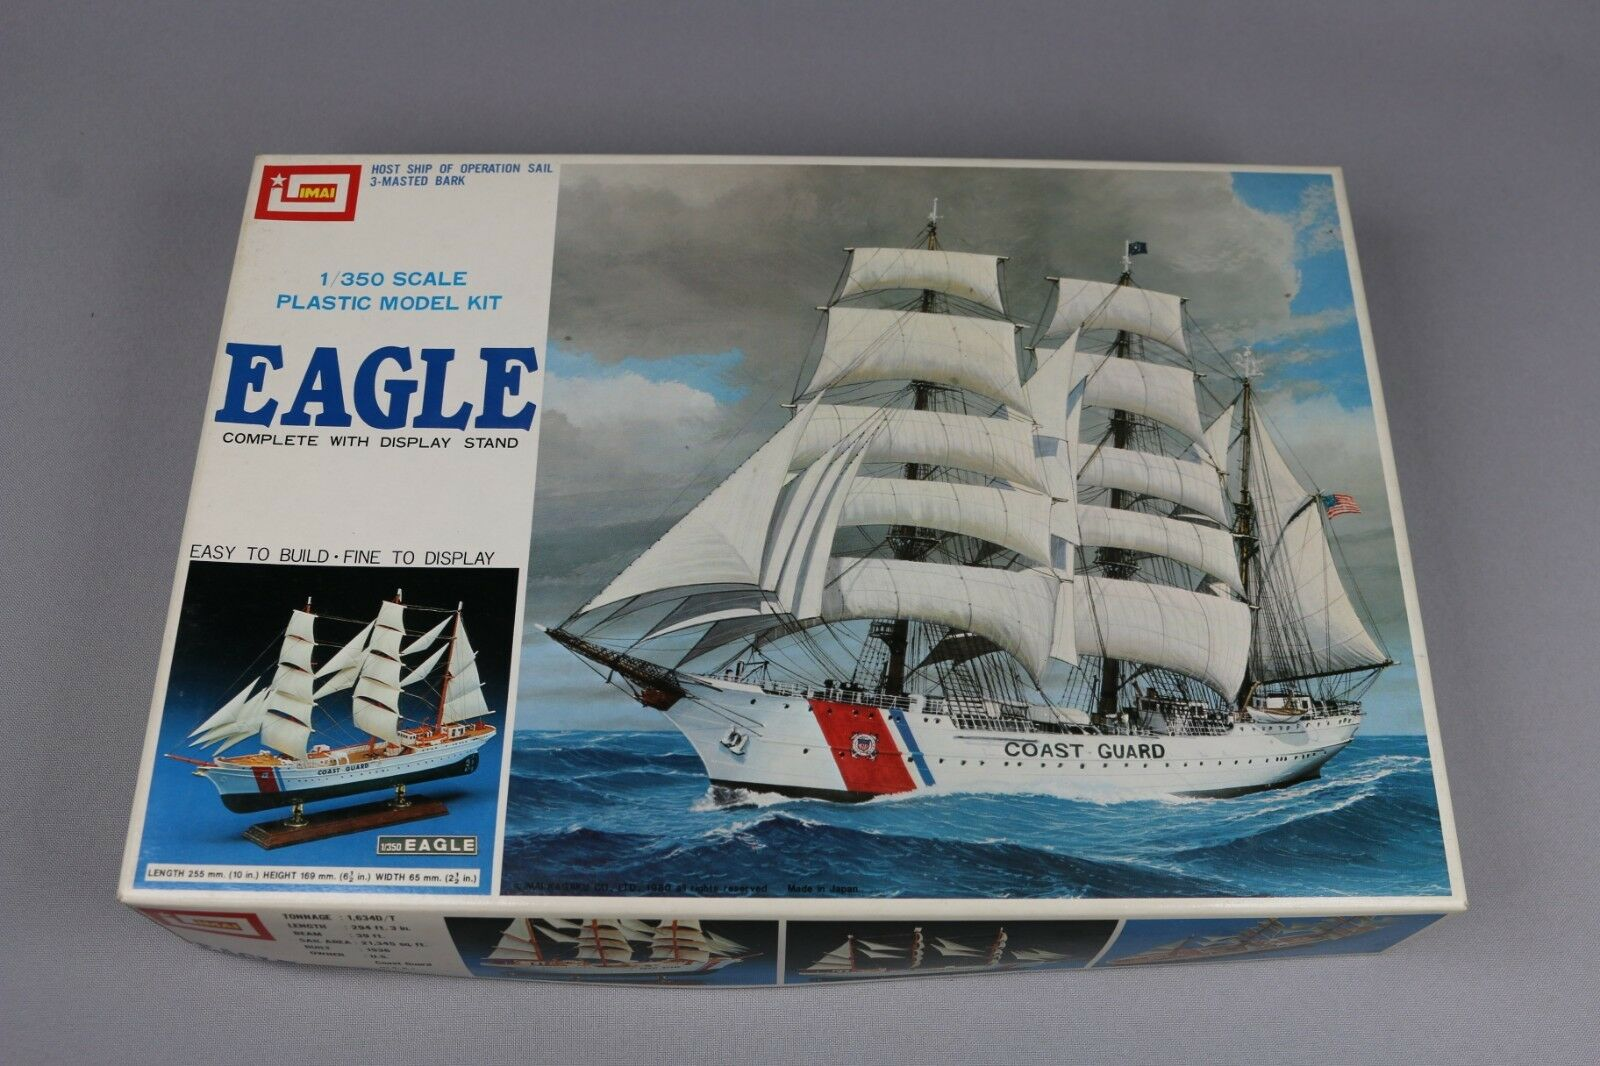 Zf929 IMAI 1 350 Model Boat b-931 Eagle host of Operation Sail 3 masted